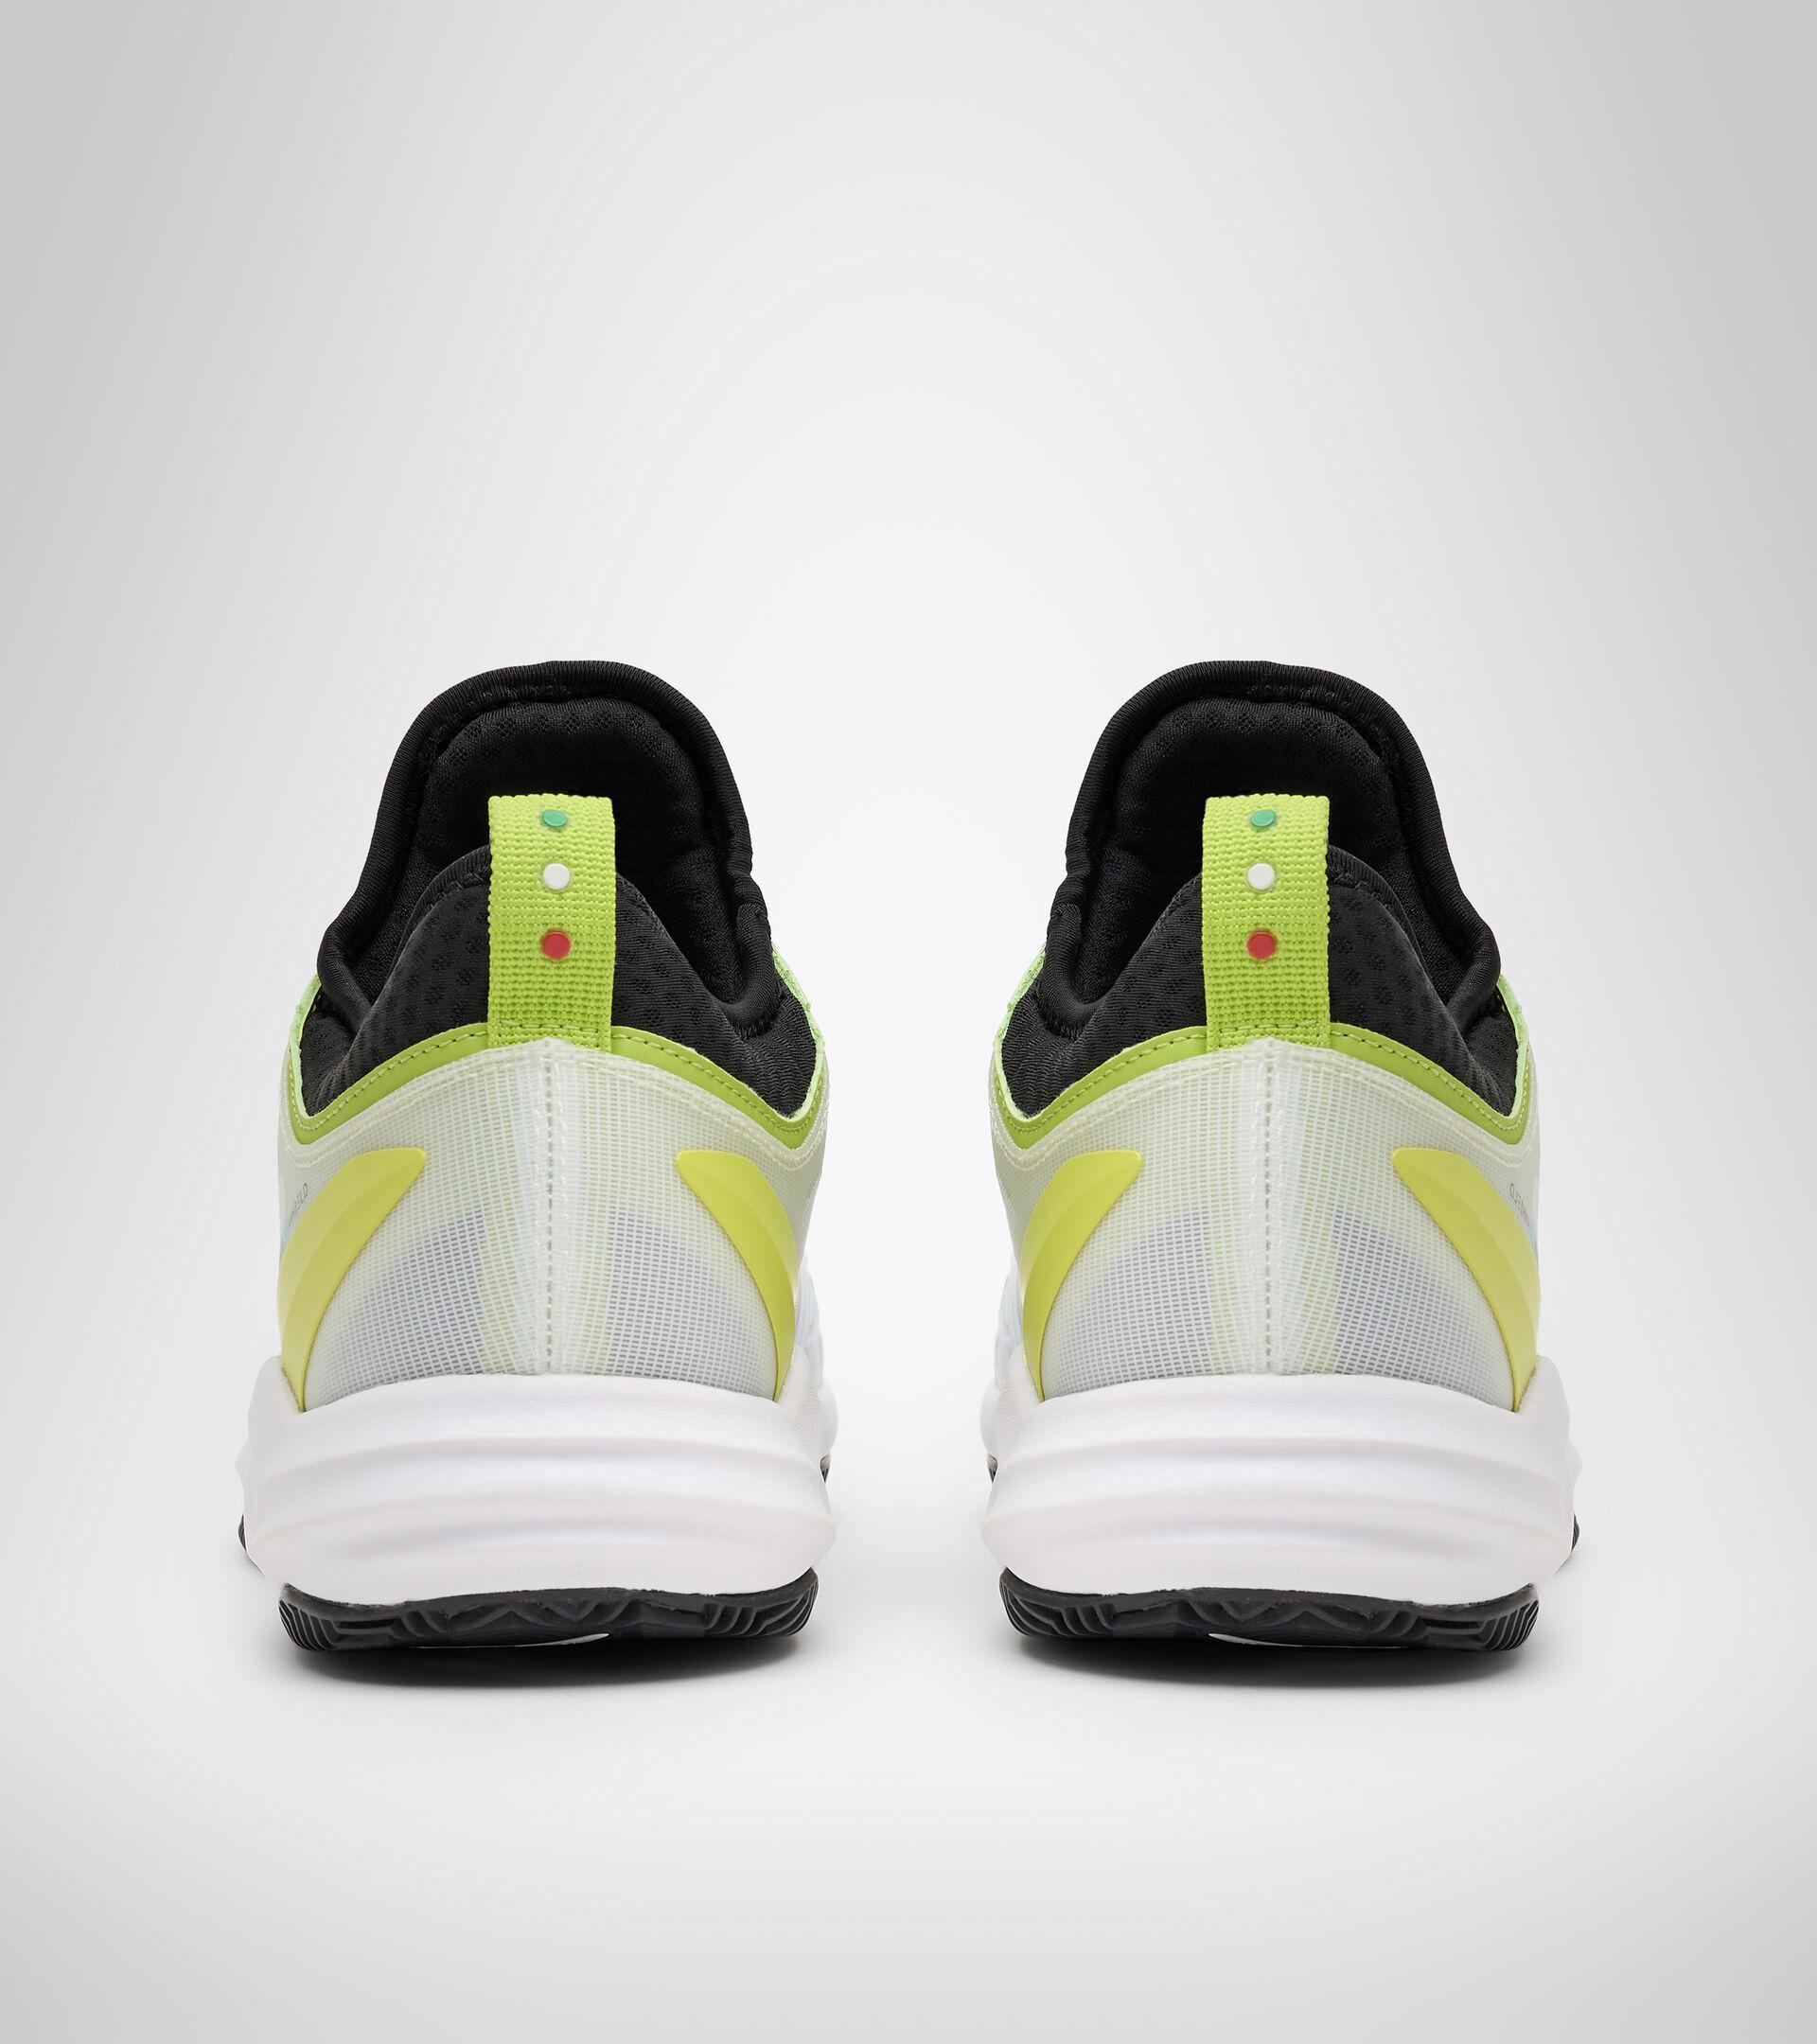 Footwear Sport UOMO SPEED BLUSHIELD FLY 3 + CLAY BLANCO/NEGRO/VERDE LIMA Diadora